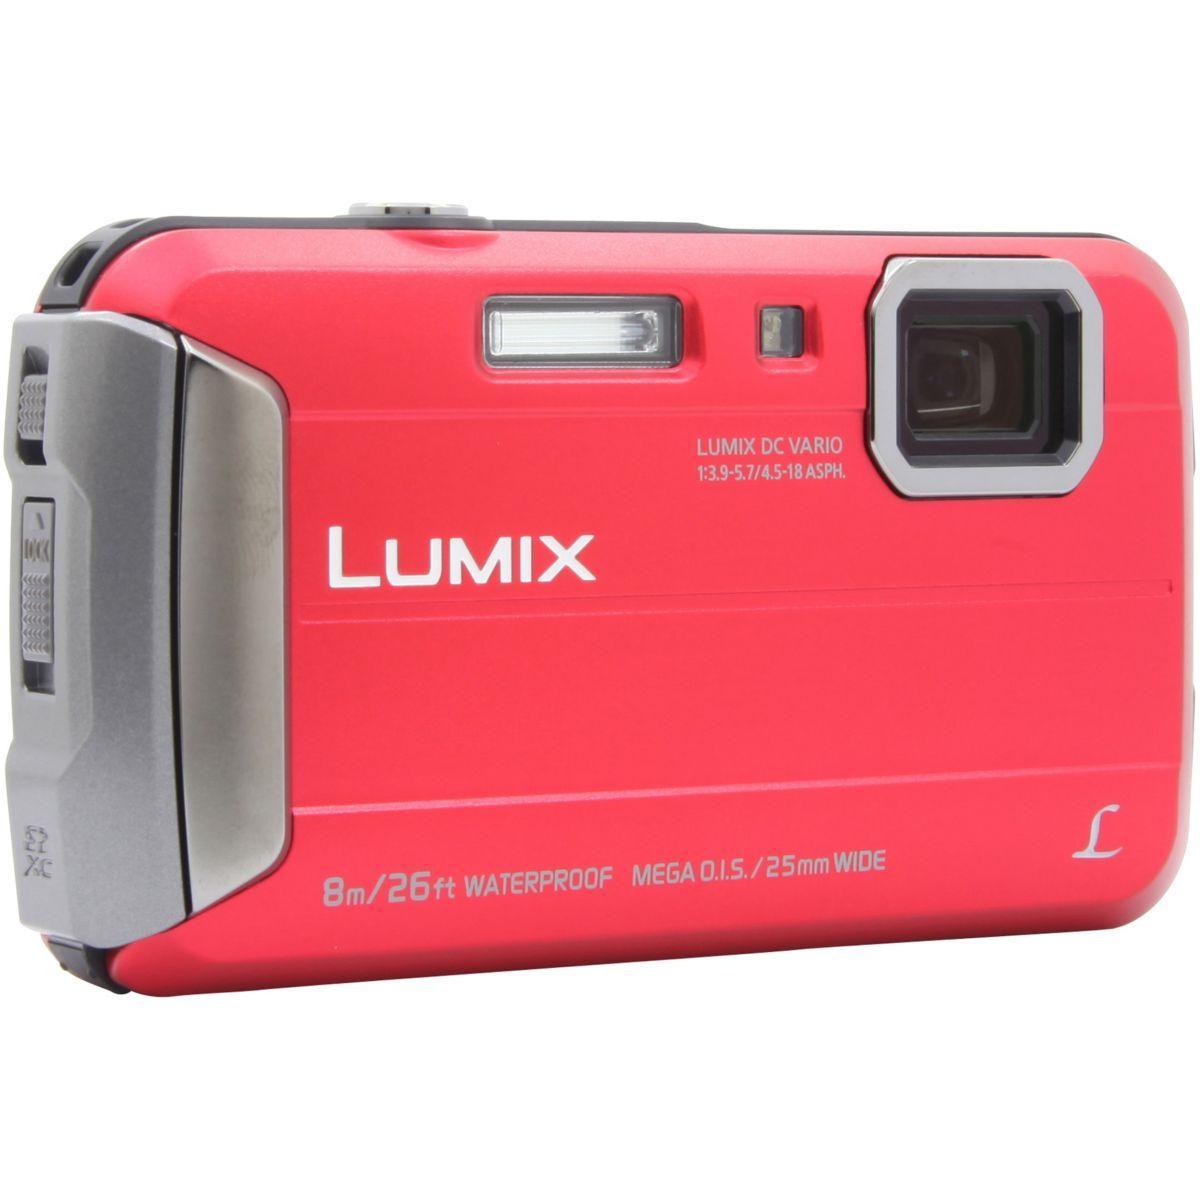 Appareil photo compact panasonic dmc-ft30 rouge (photo)